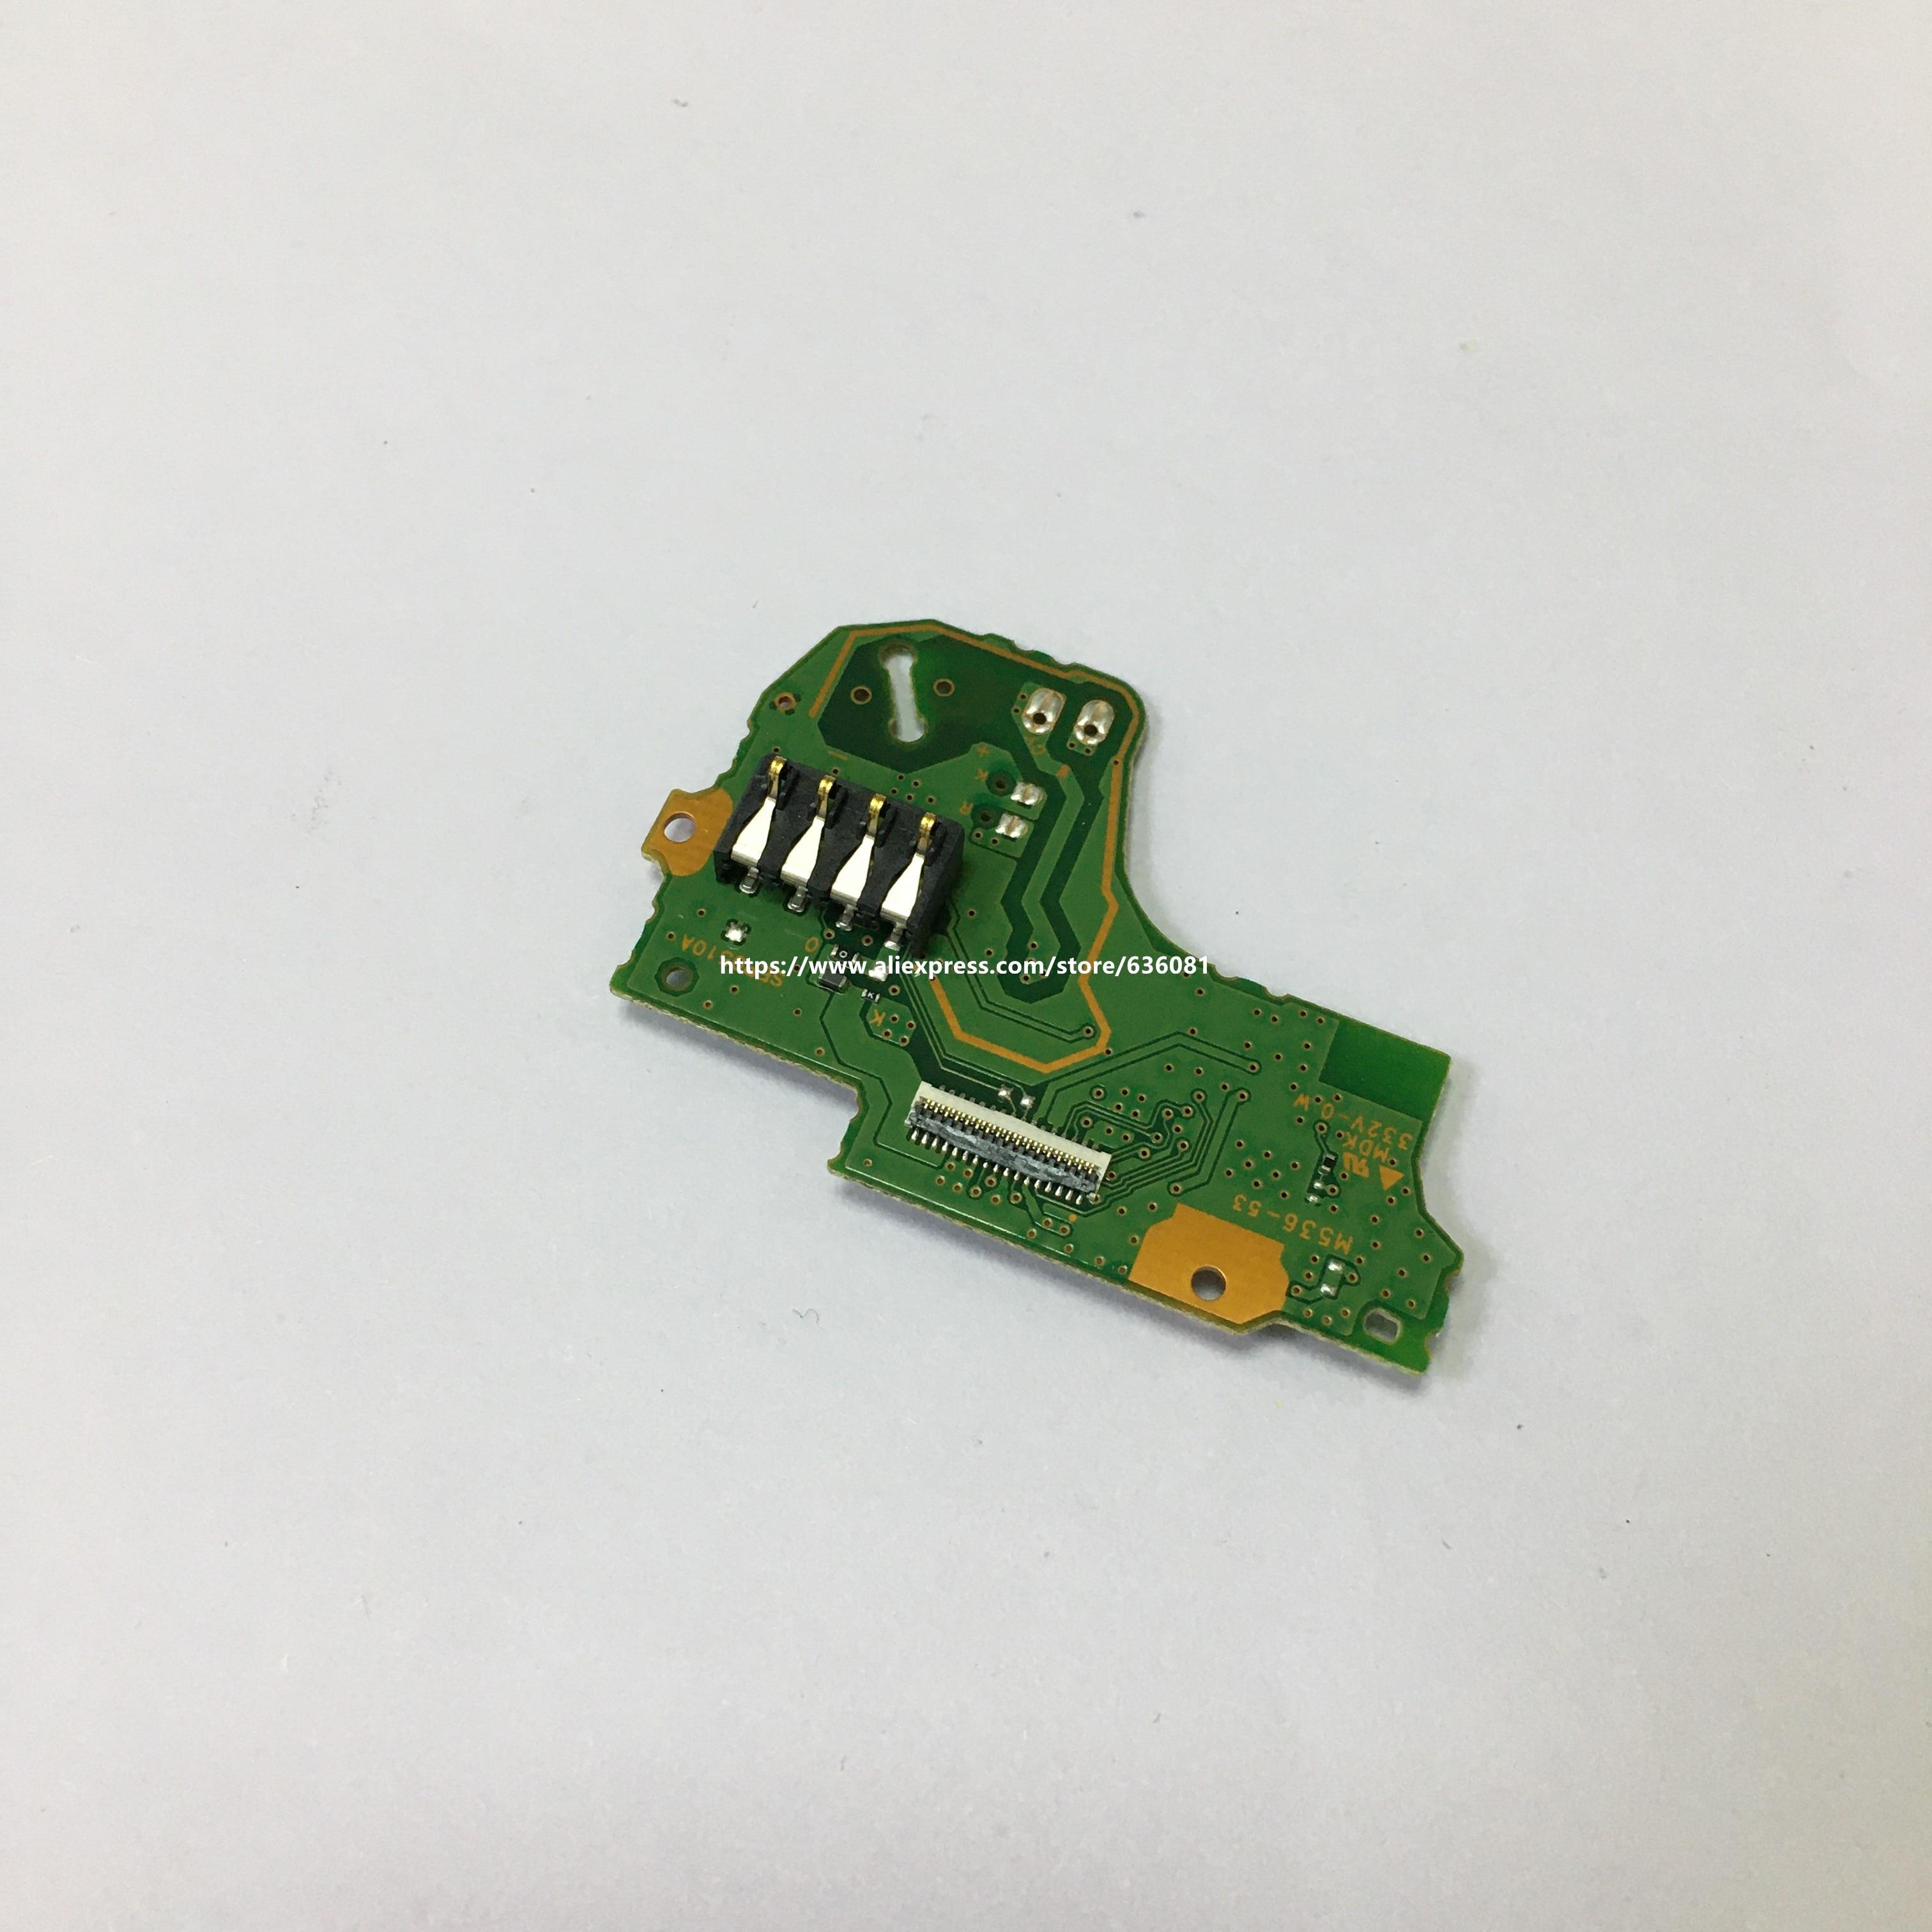 Replacement Repair Parts Panasonic Lumix DMC-ZS35 TZ55 Rear Control Board